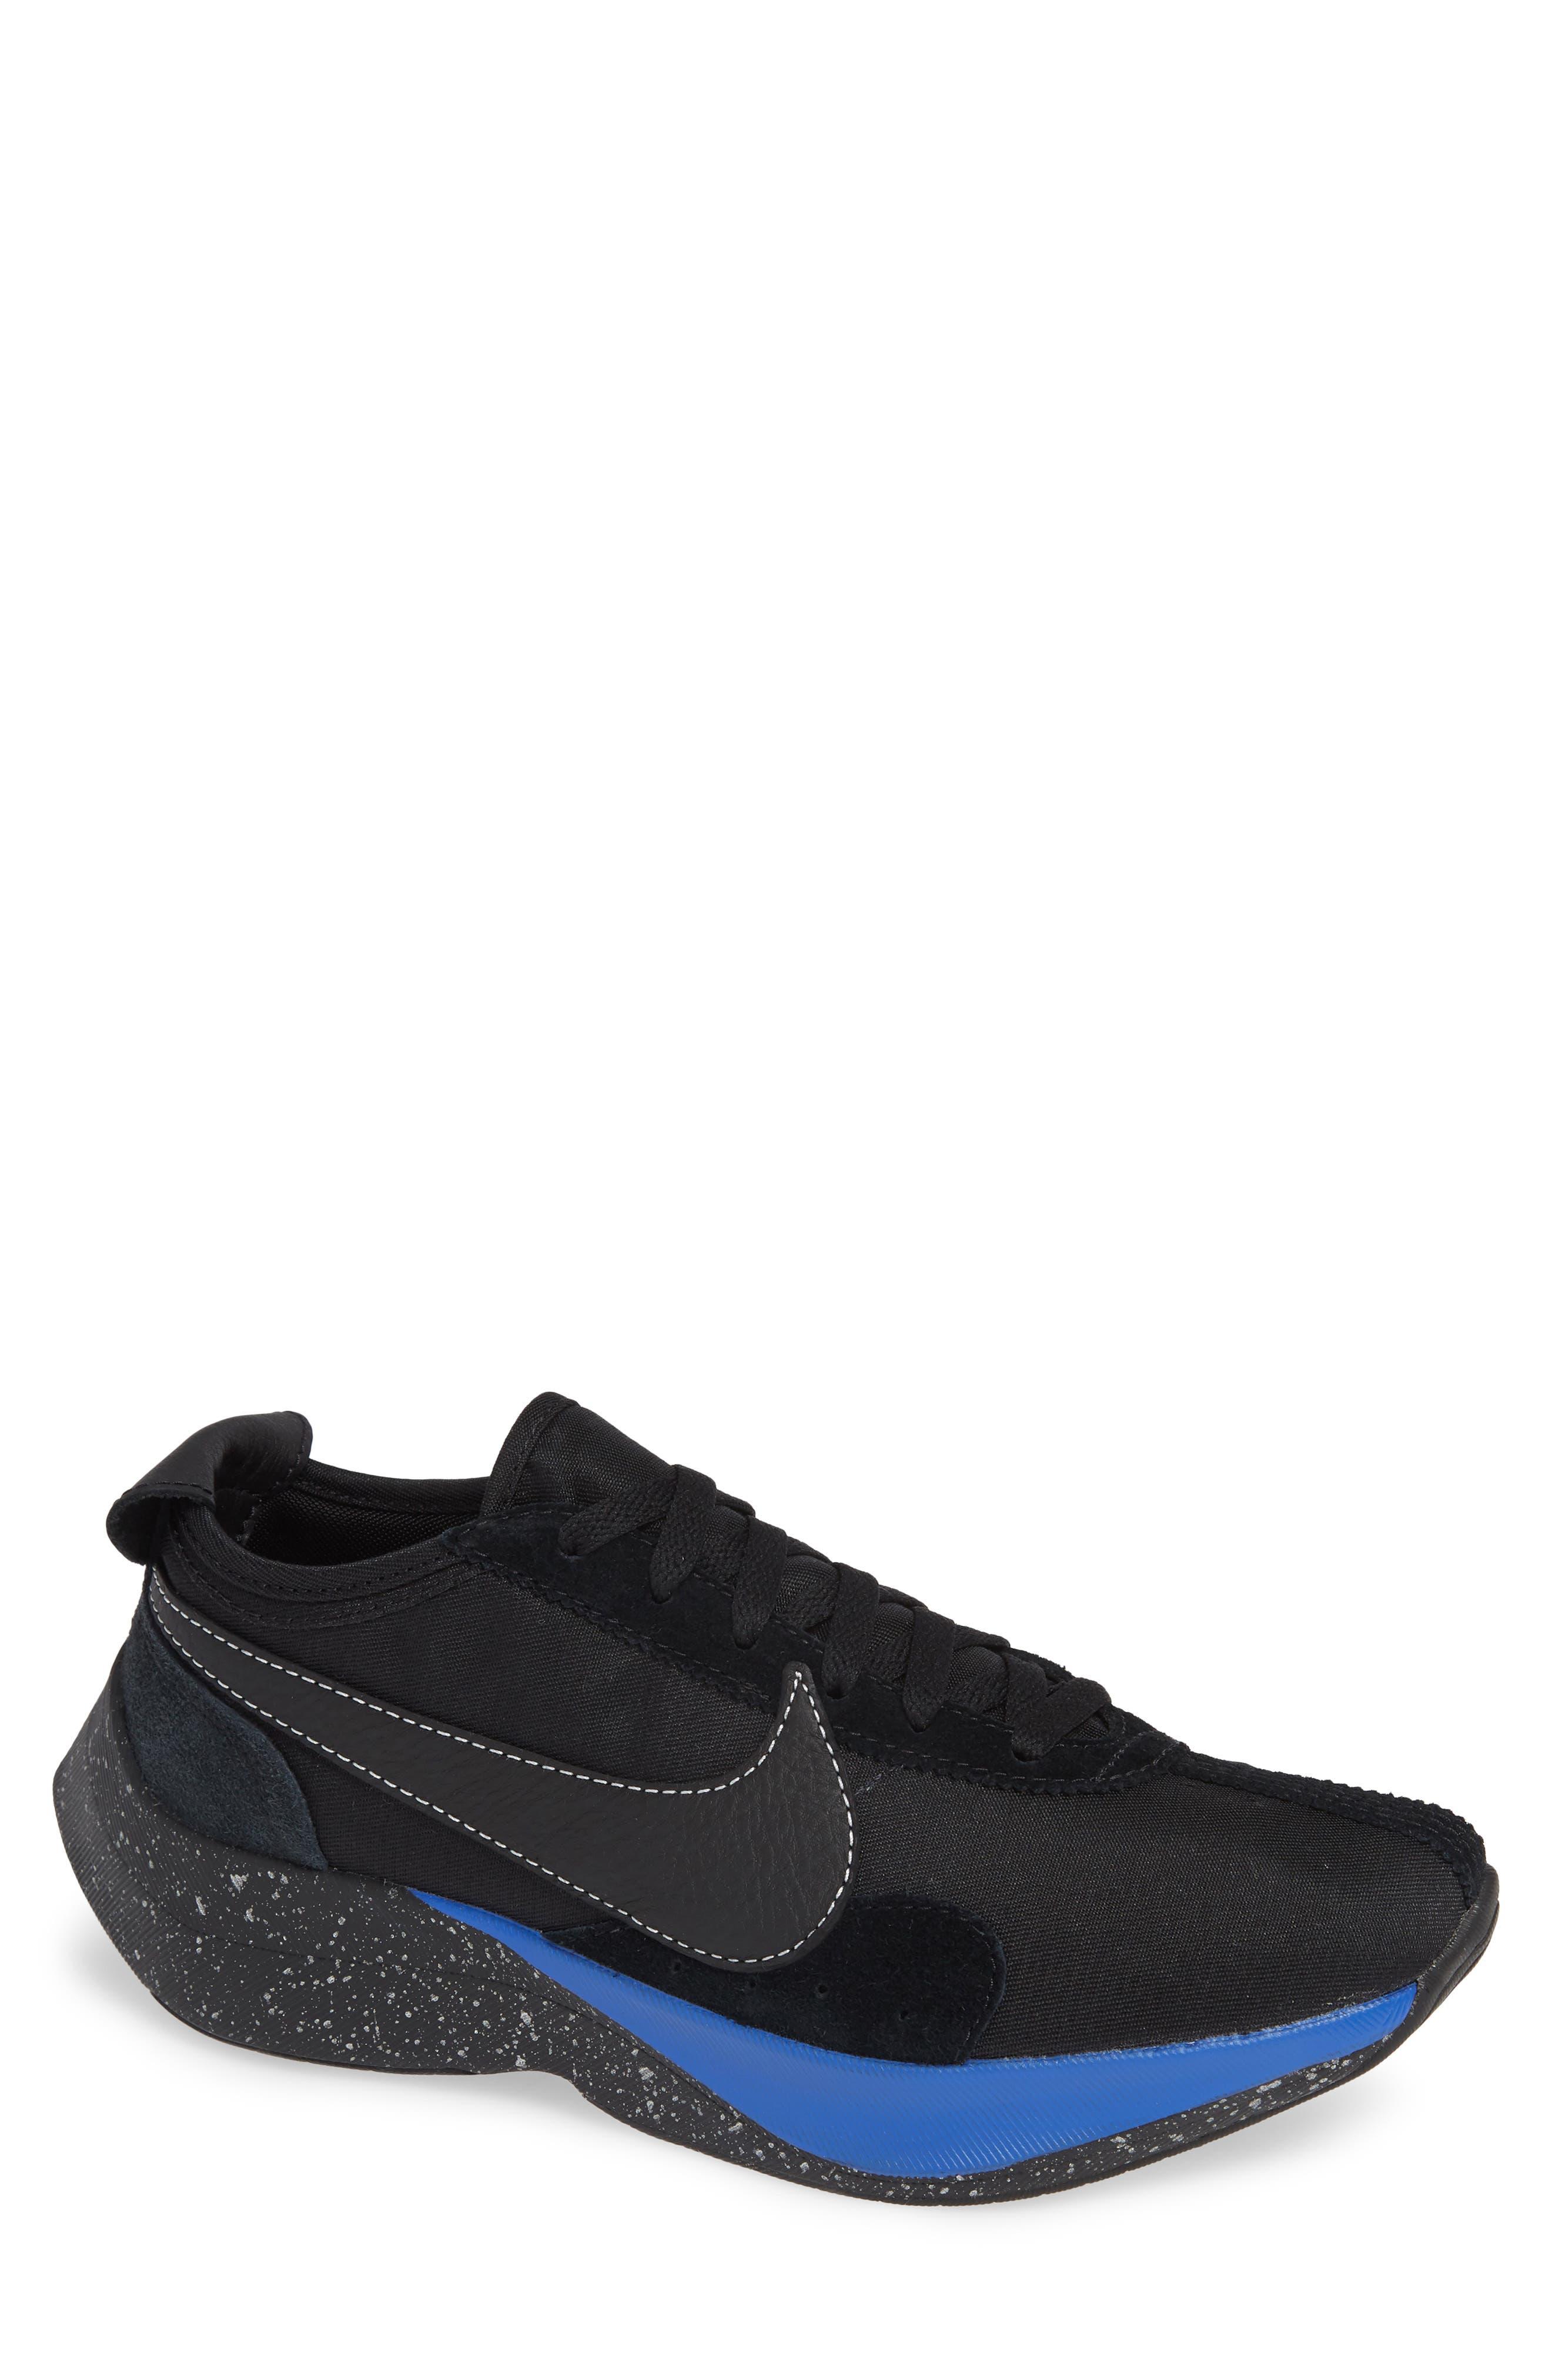 NIKE,                             Moon Racer QS Sneaker,                             Main thumbnail 1, color,                             001